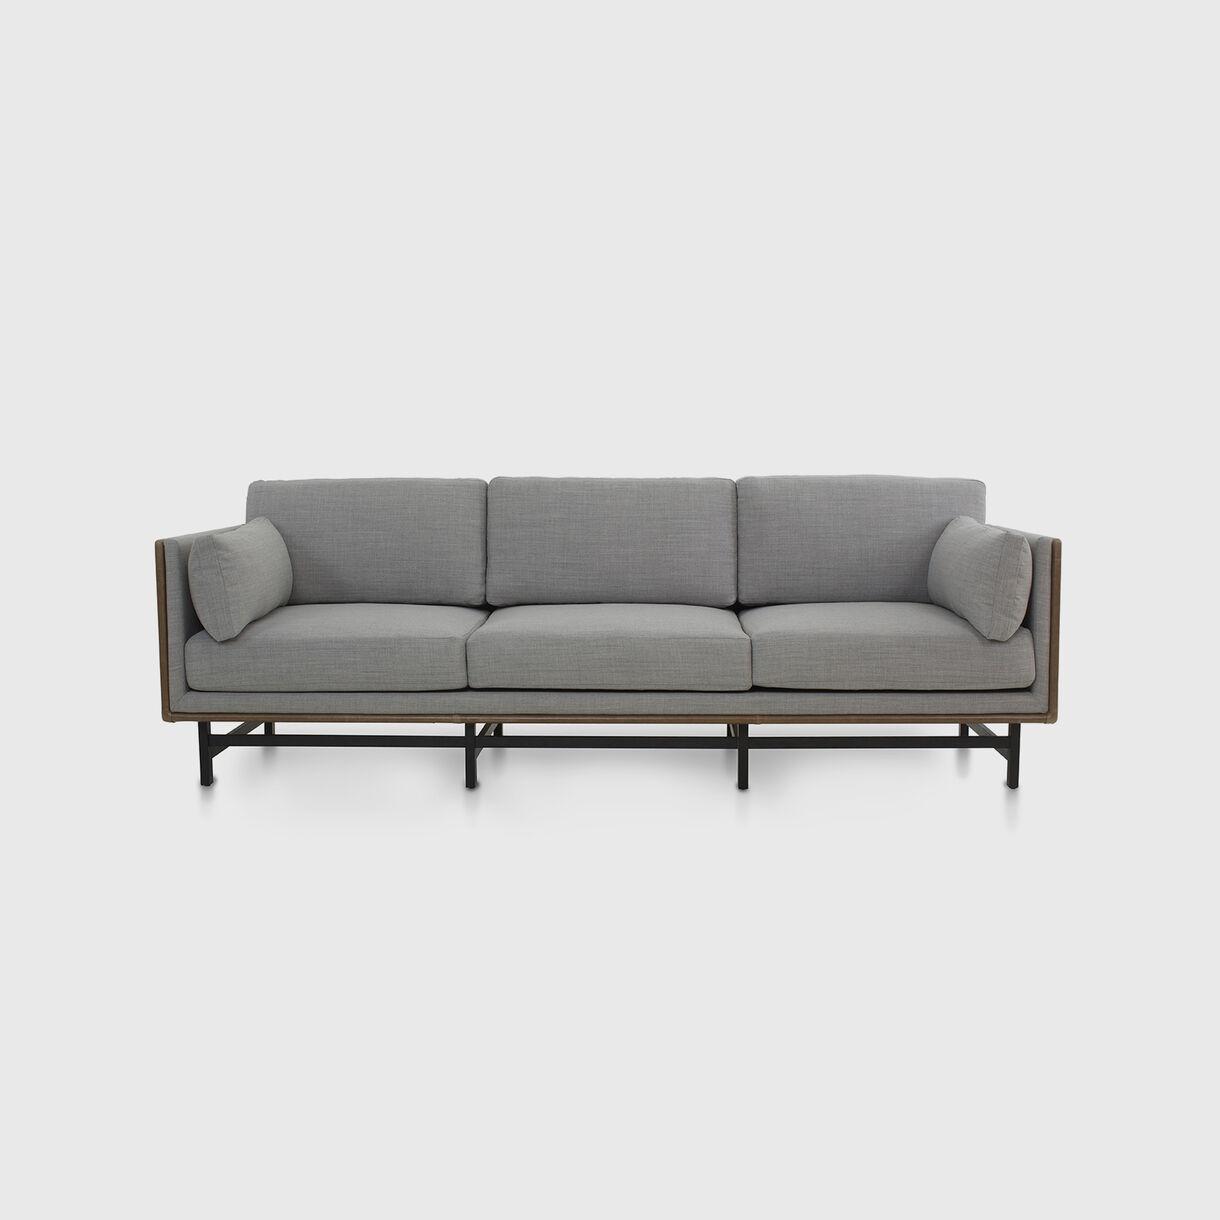 SW Sofa Three Seater